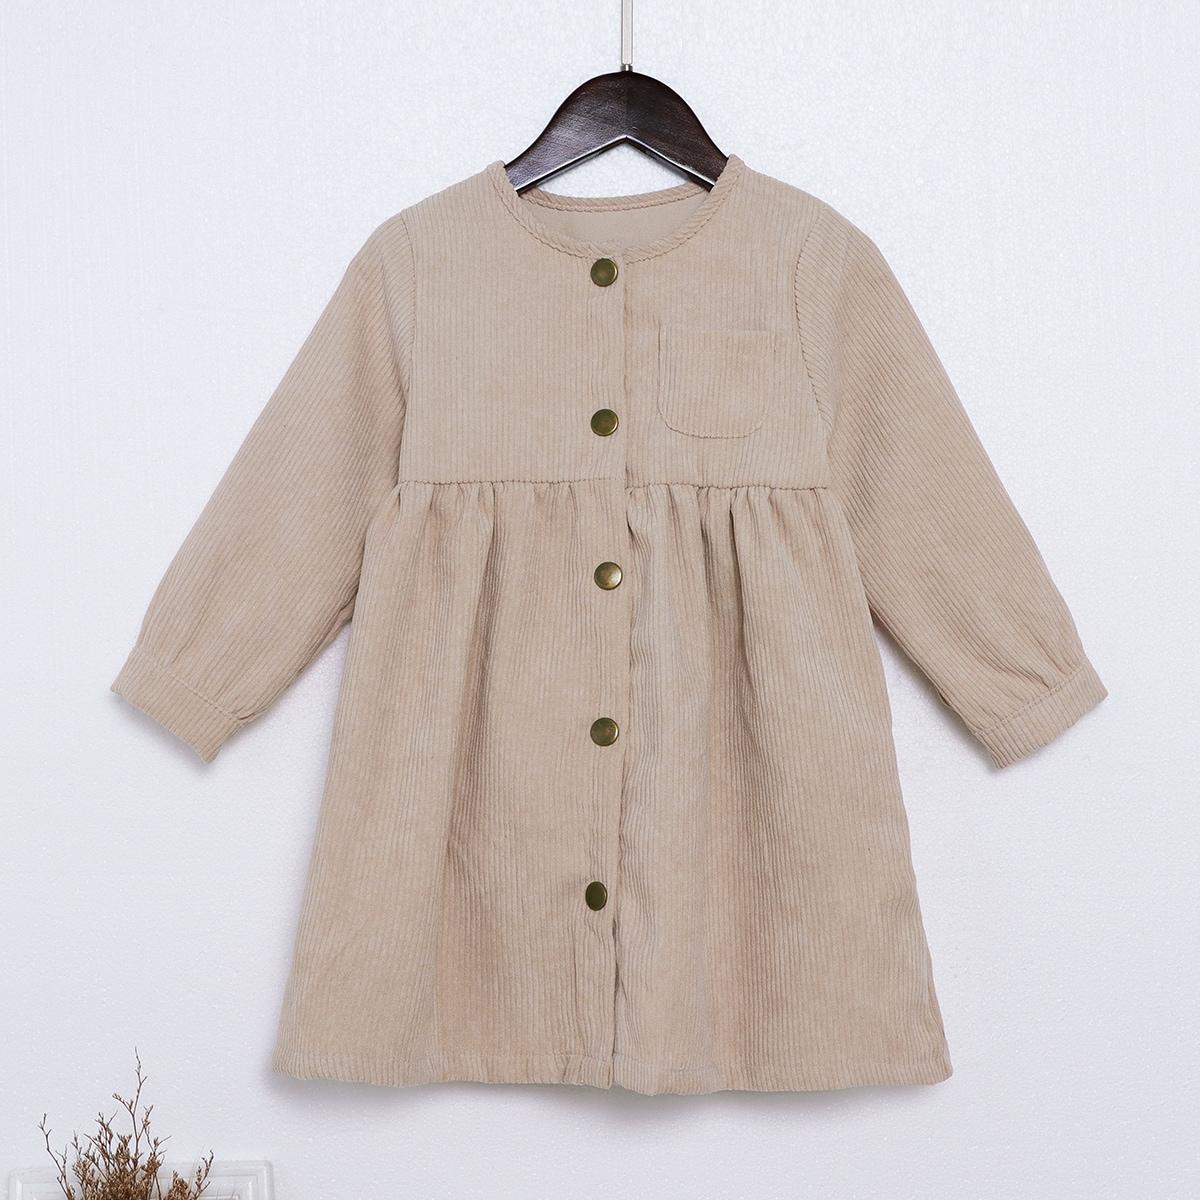 Toddler Girls Button Front Corduroy Smock Dress